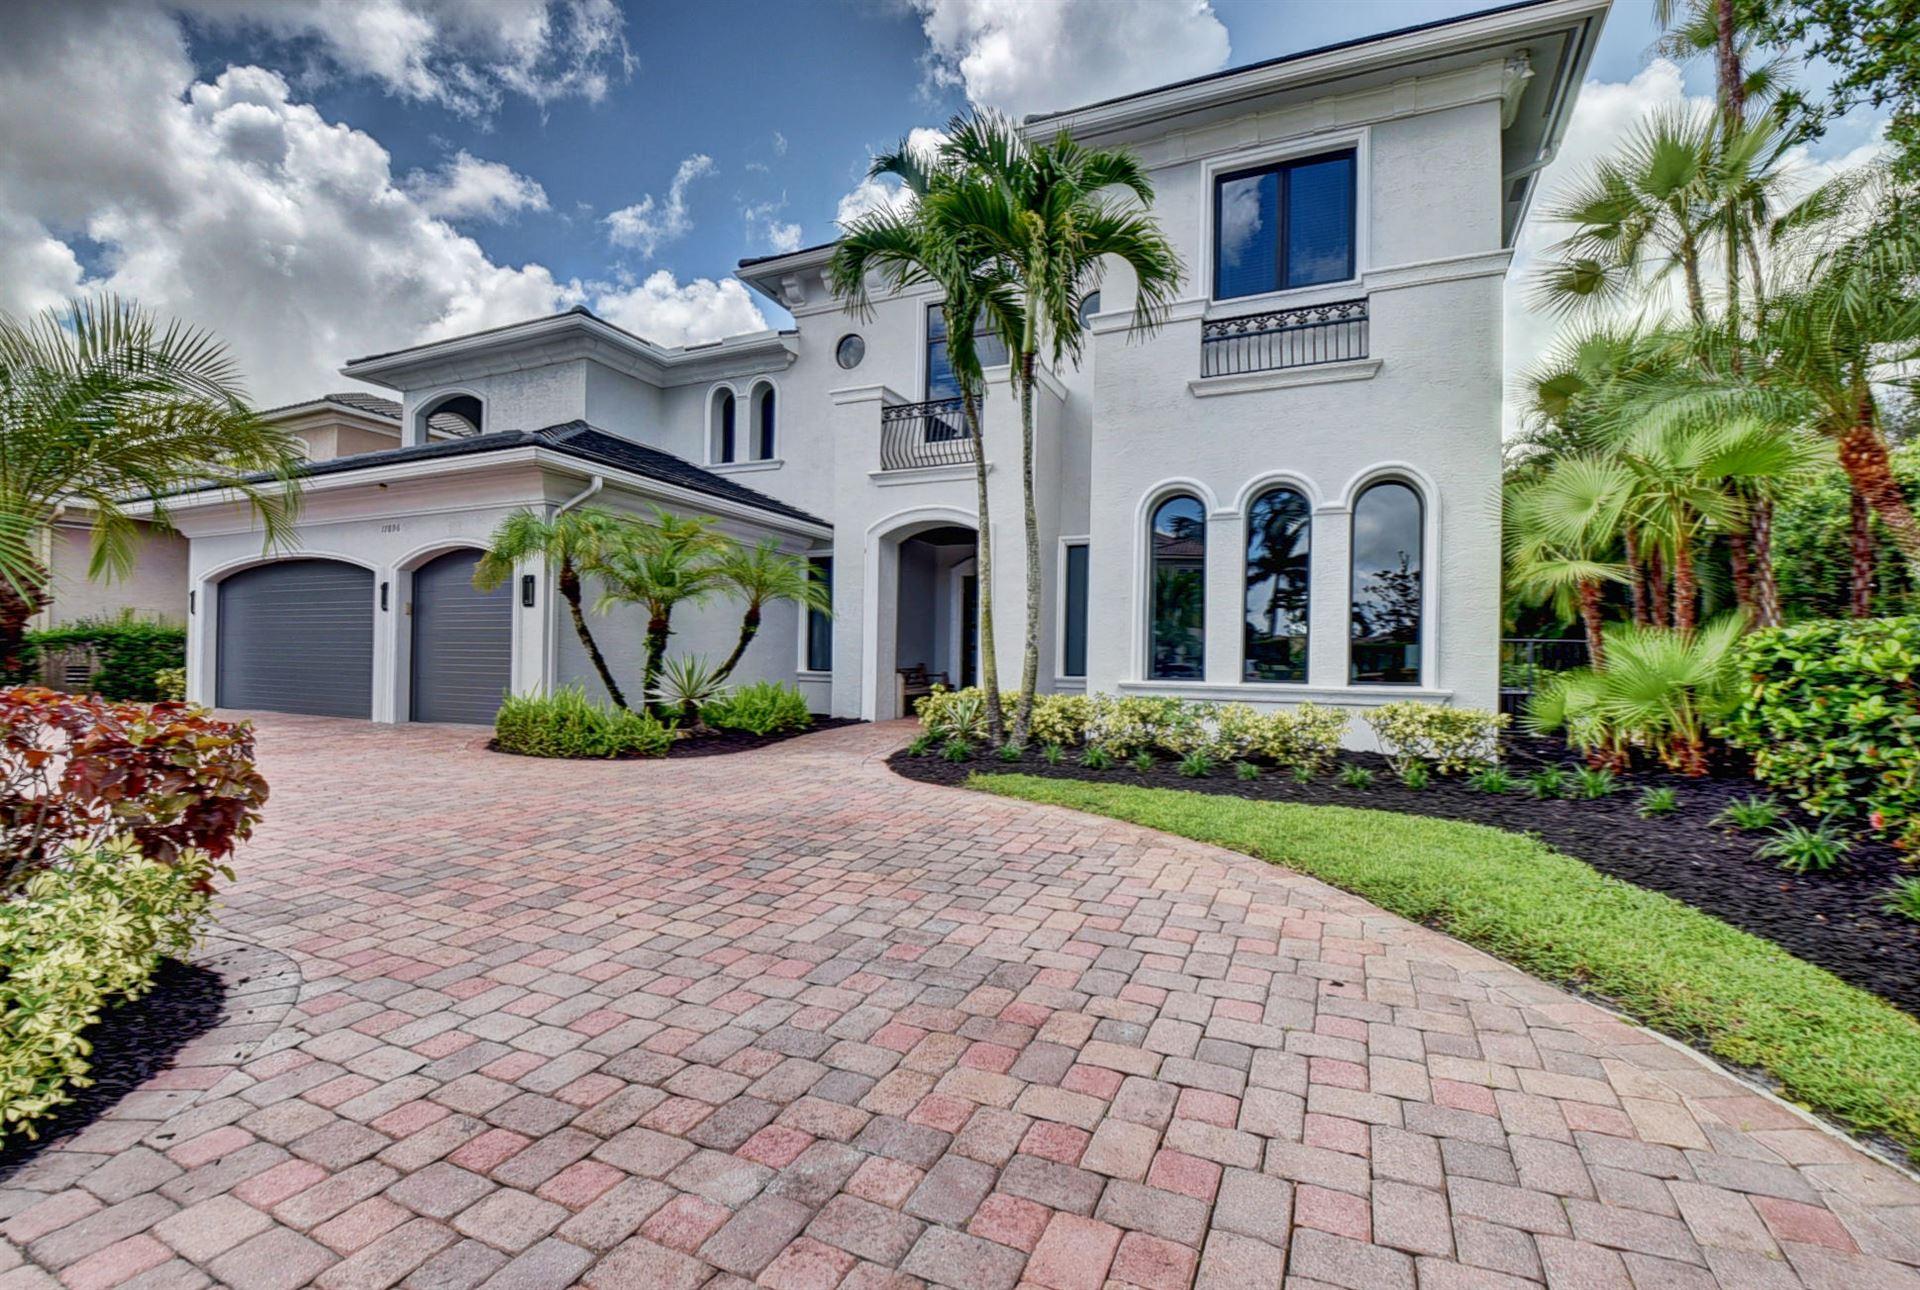 17896 Key Vista Way, Boca Raton, FL 33496 - MLS#: RX-10729767